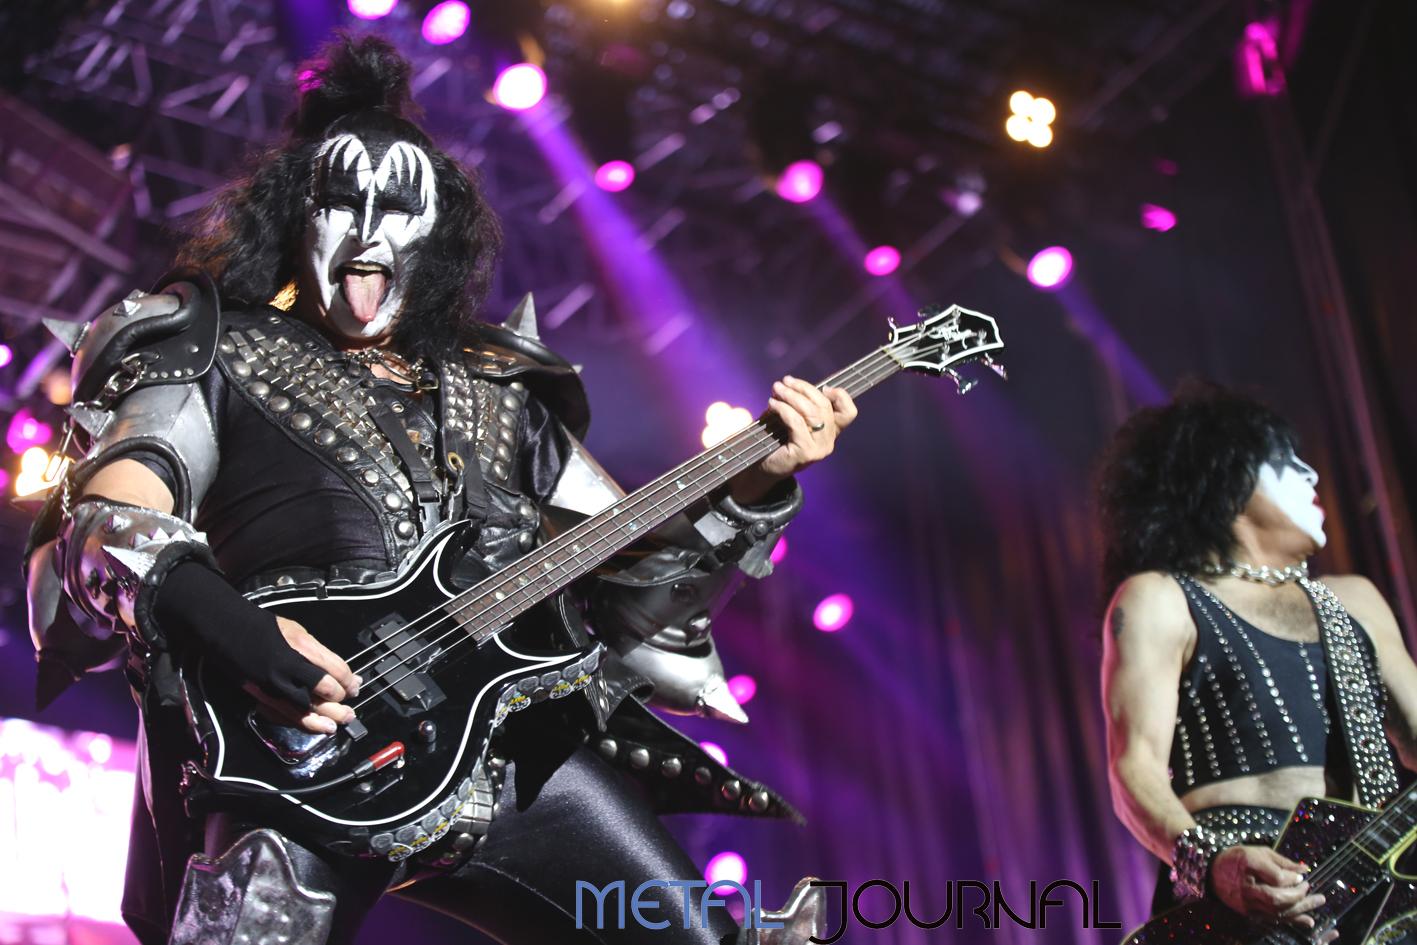 kiss rock fest 18 - metal journal pic 3